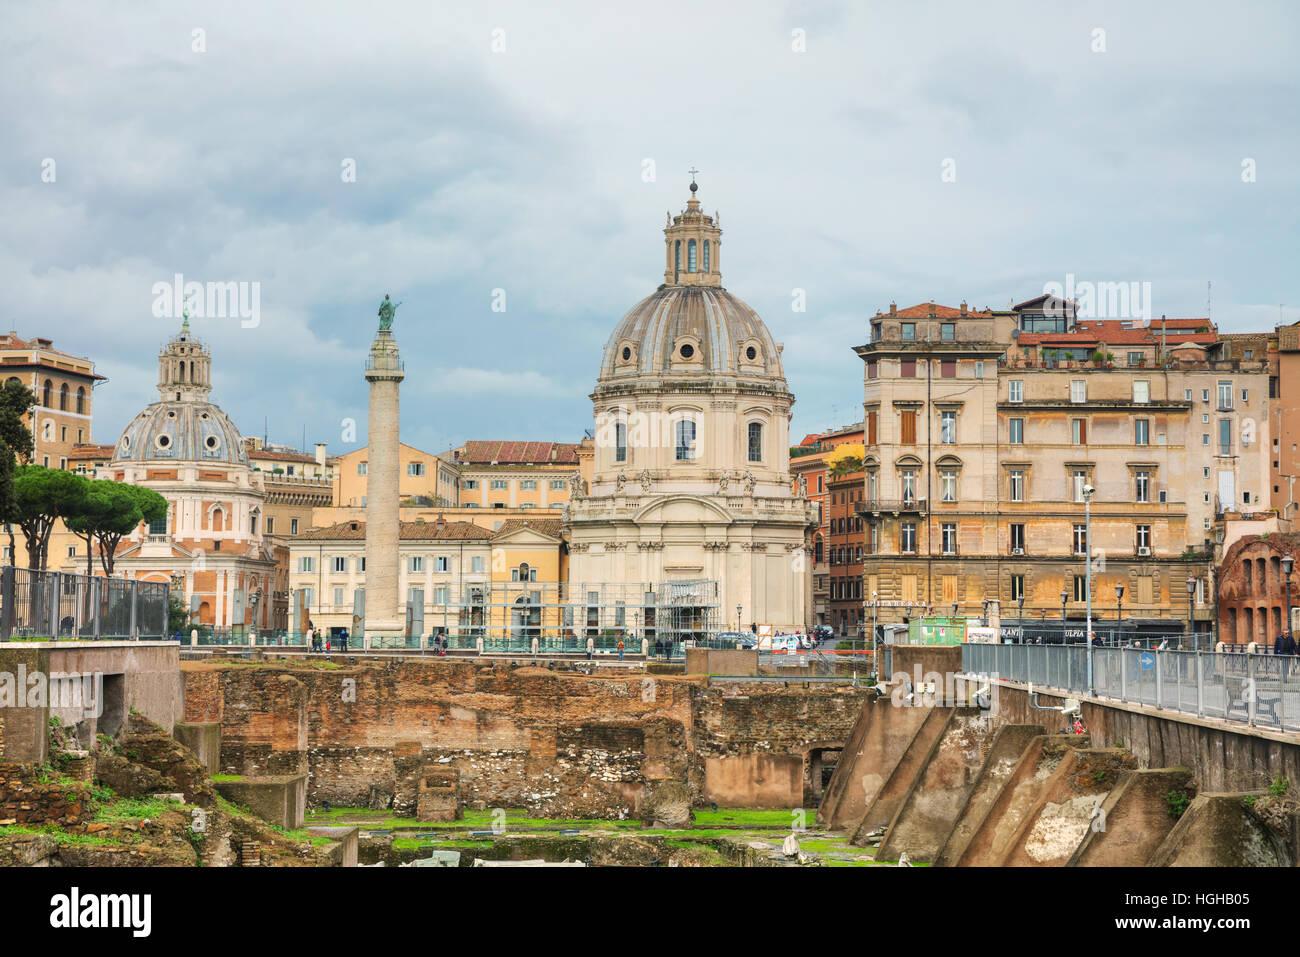 ROME - NOVEMBER 07: Santa Maria di Loreto church and Colonna Traiana with people on November 7, 2016 in Rome, Italy. Stock Photo